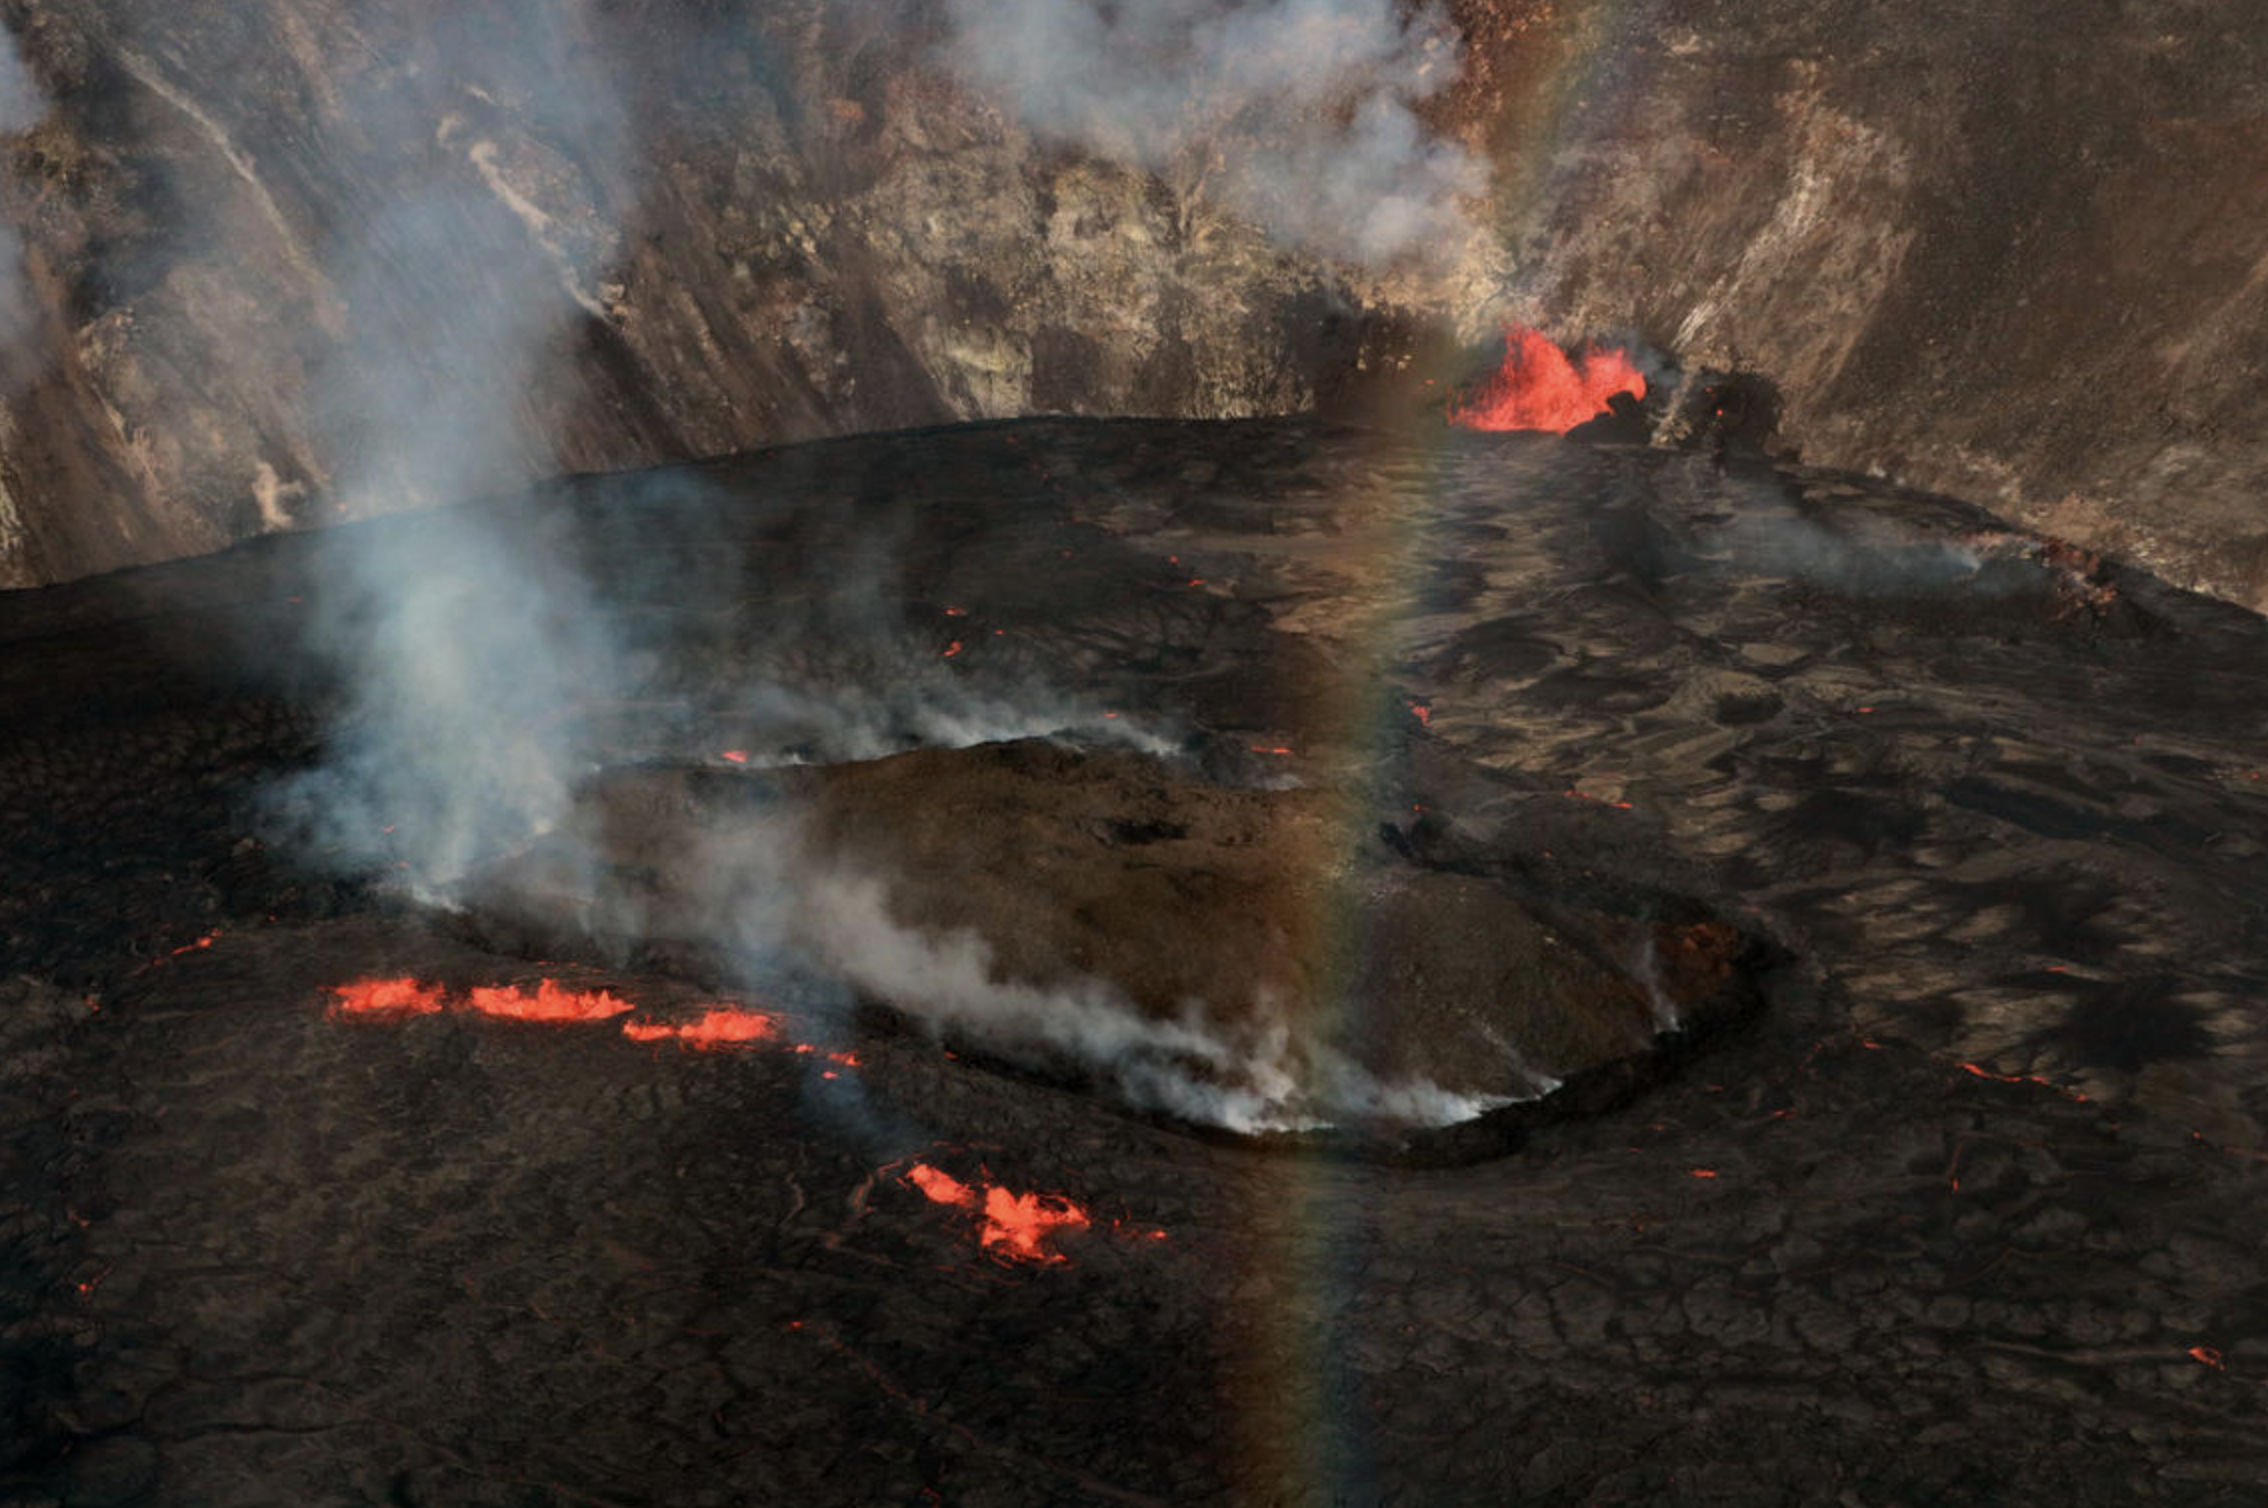 Volcano Watch: New Eruption at Halemaʻumaʻu After 4 Month Hiatus